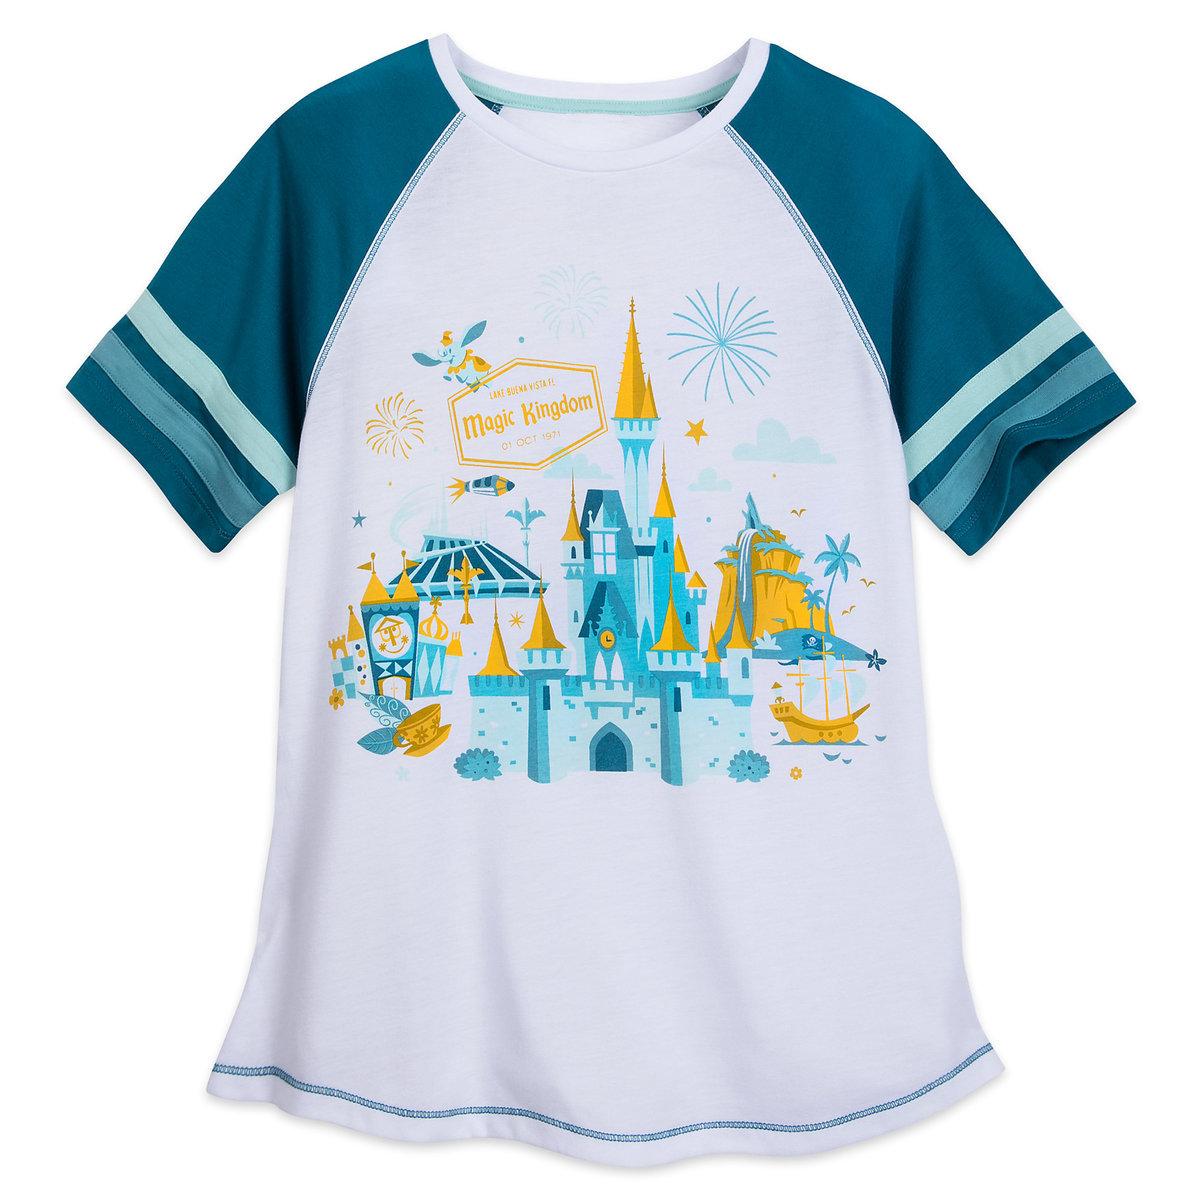 994d1b849 Disney Women s Shirt - Magic Kingdom Raglan